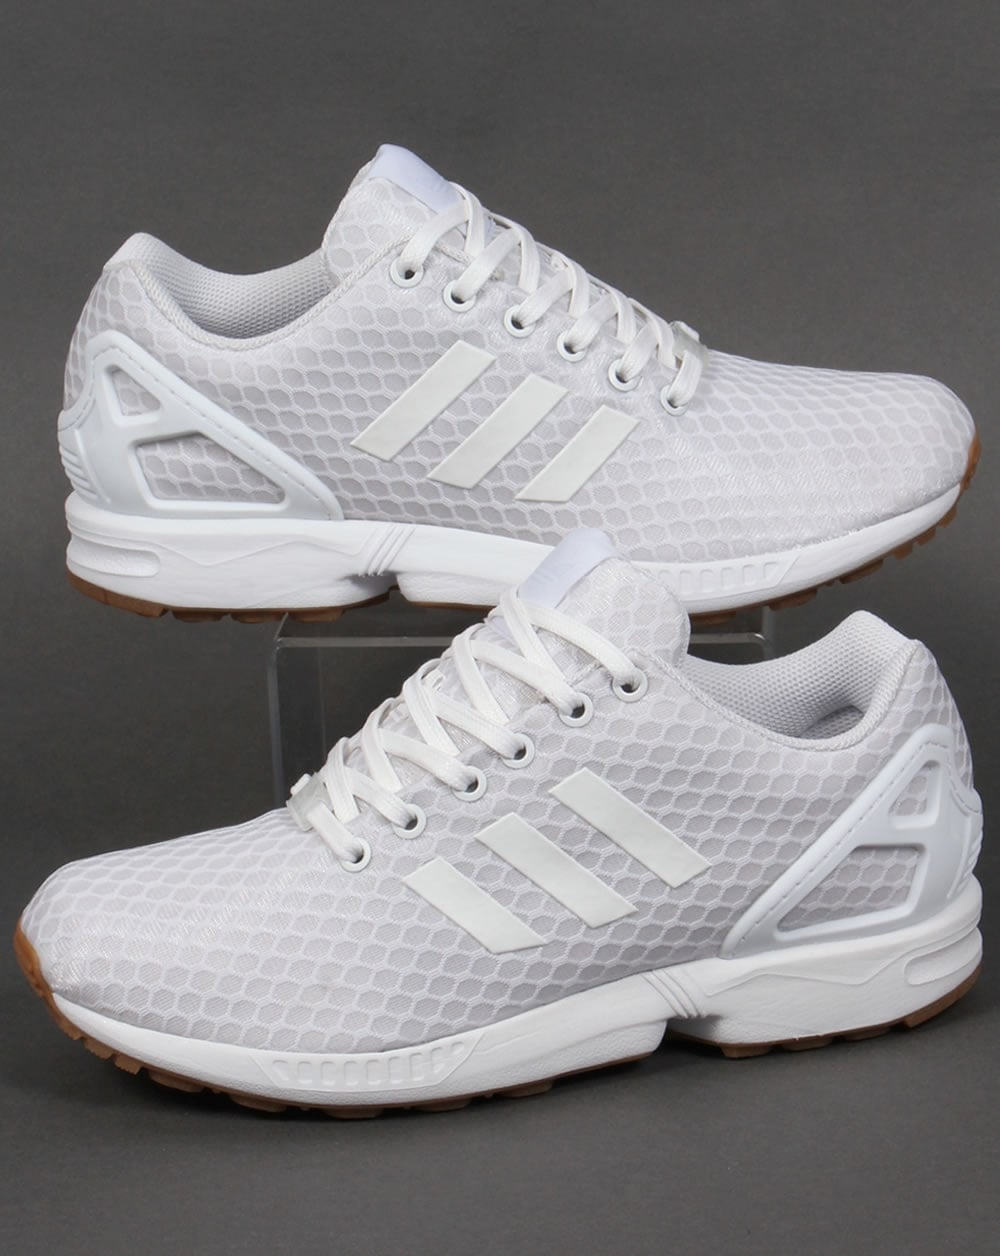 adidas zx flux 47